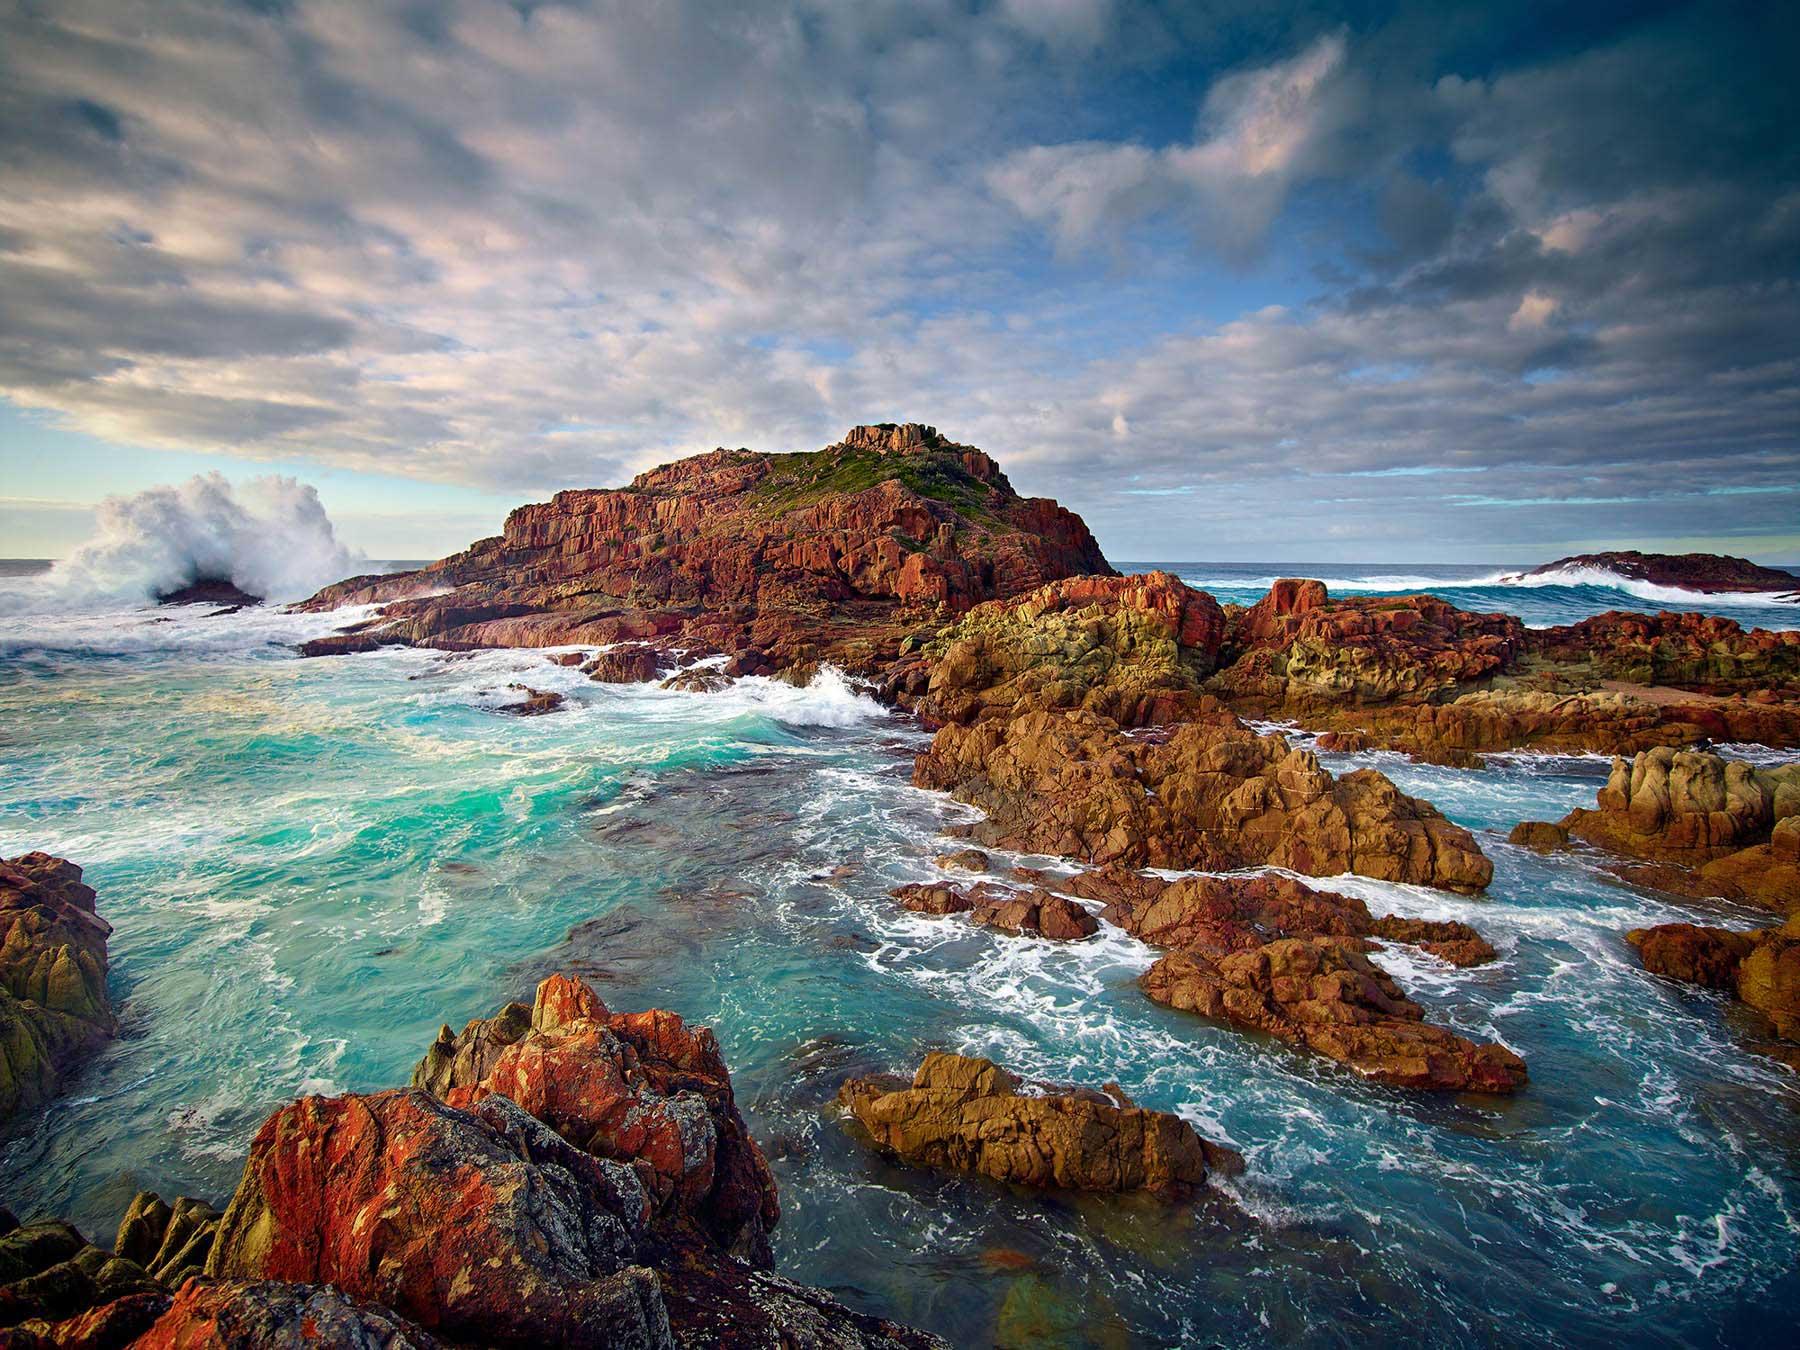 Lichen covered rocks and pounding waves, Minmosa Rocks, NSW, Australia.